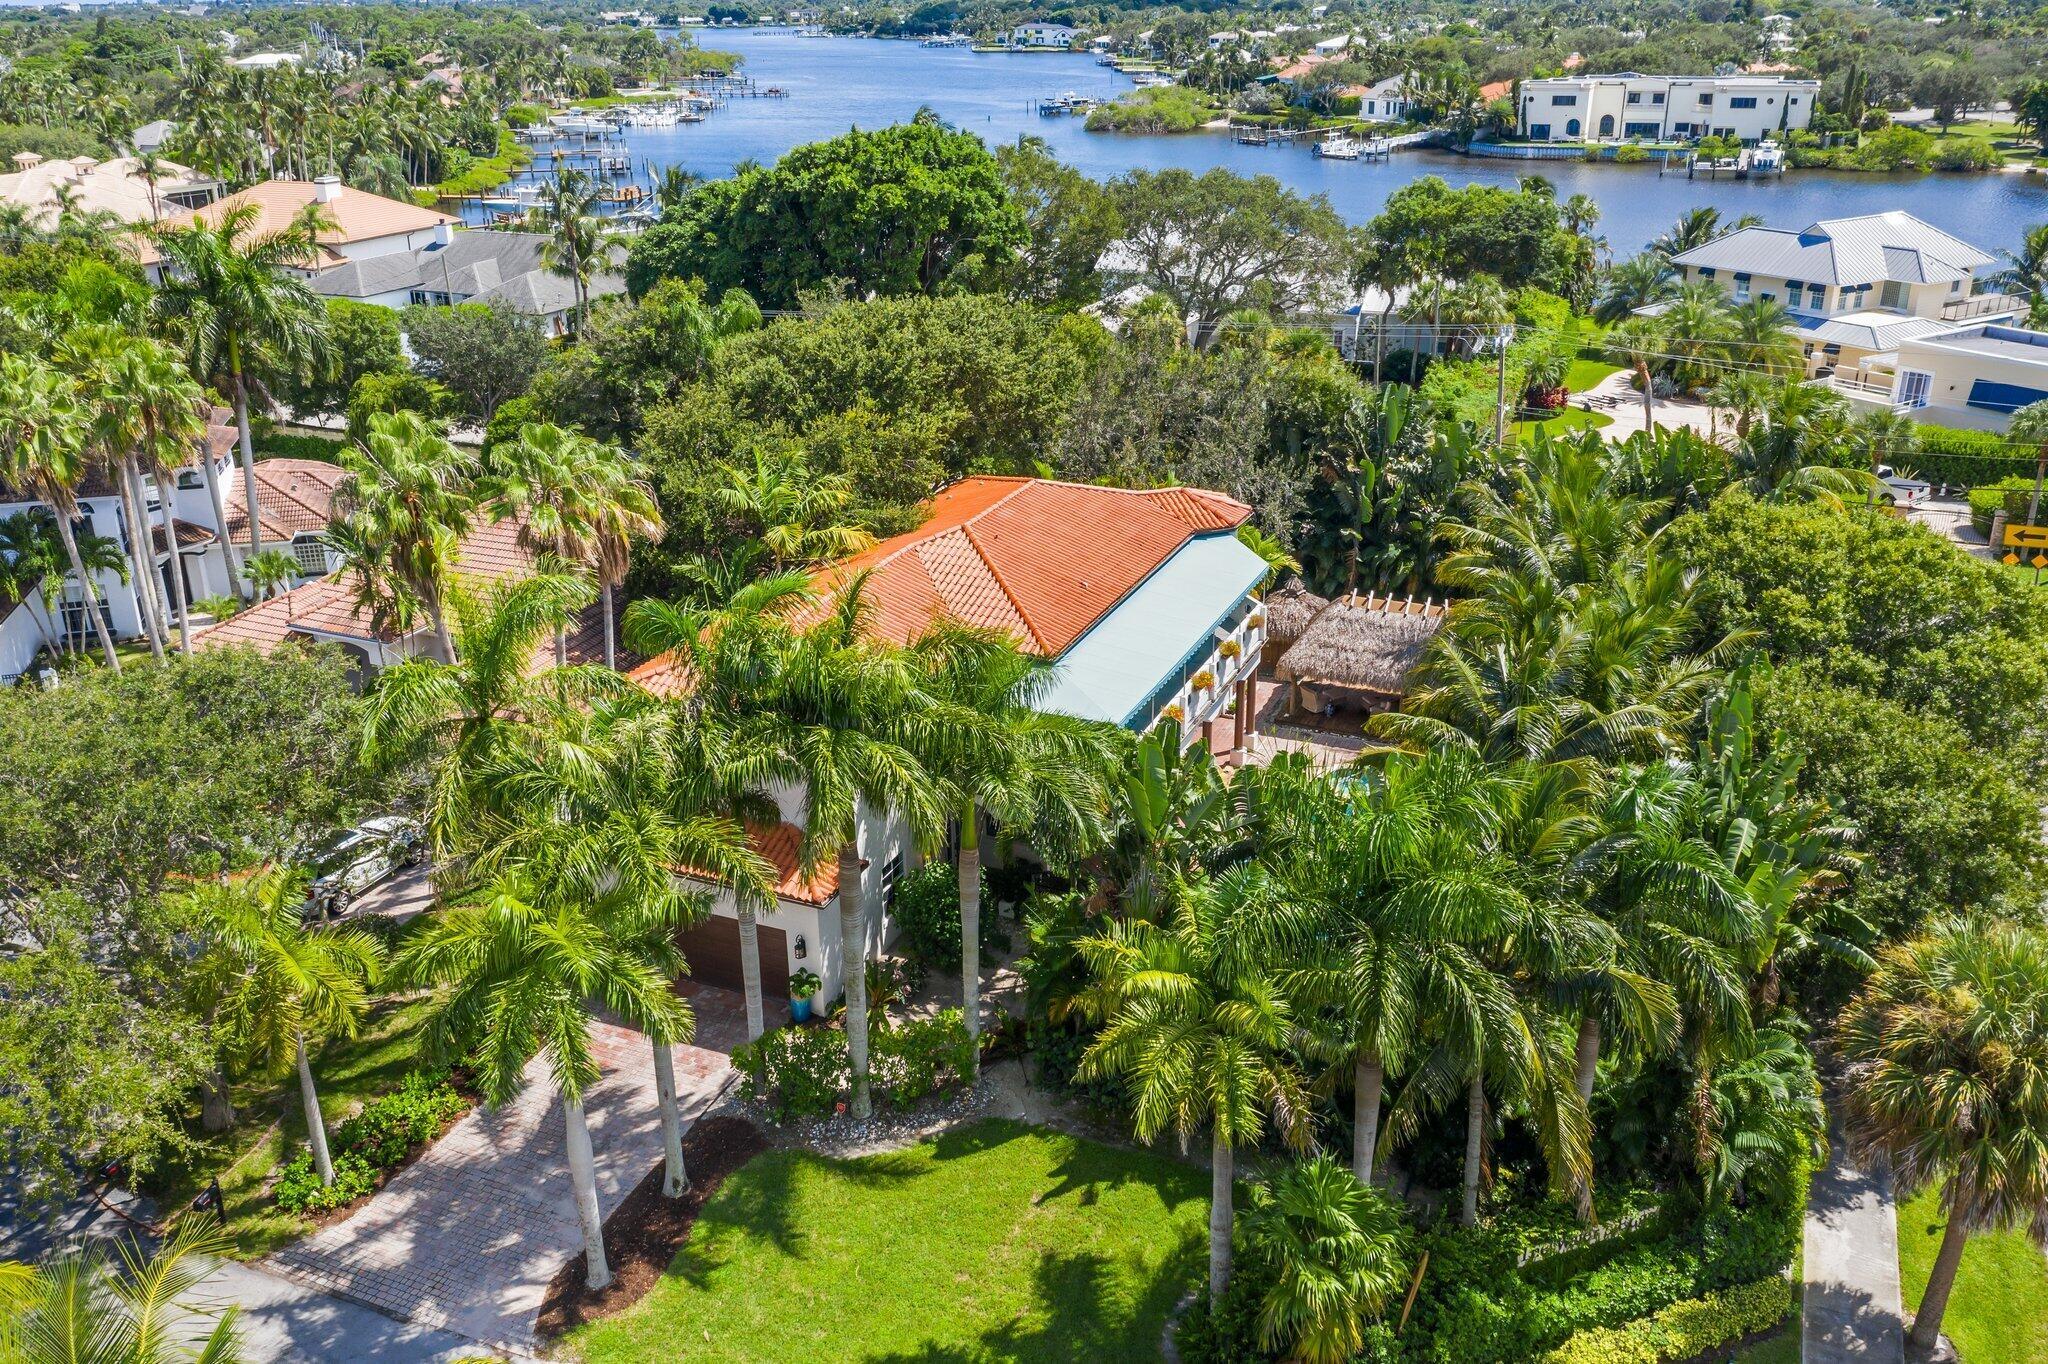 10802 Arielle, Tequesta, Florida 33469